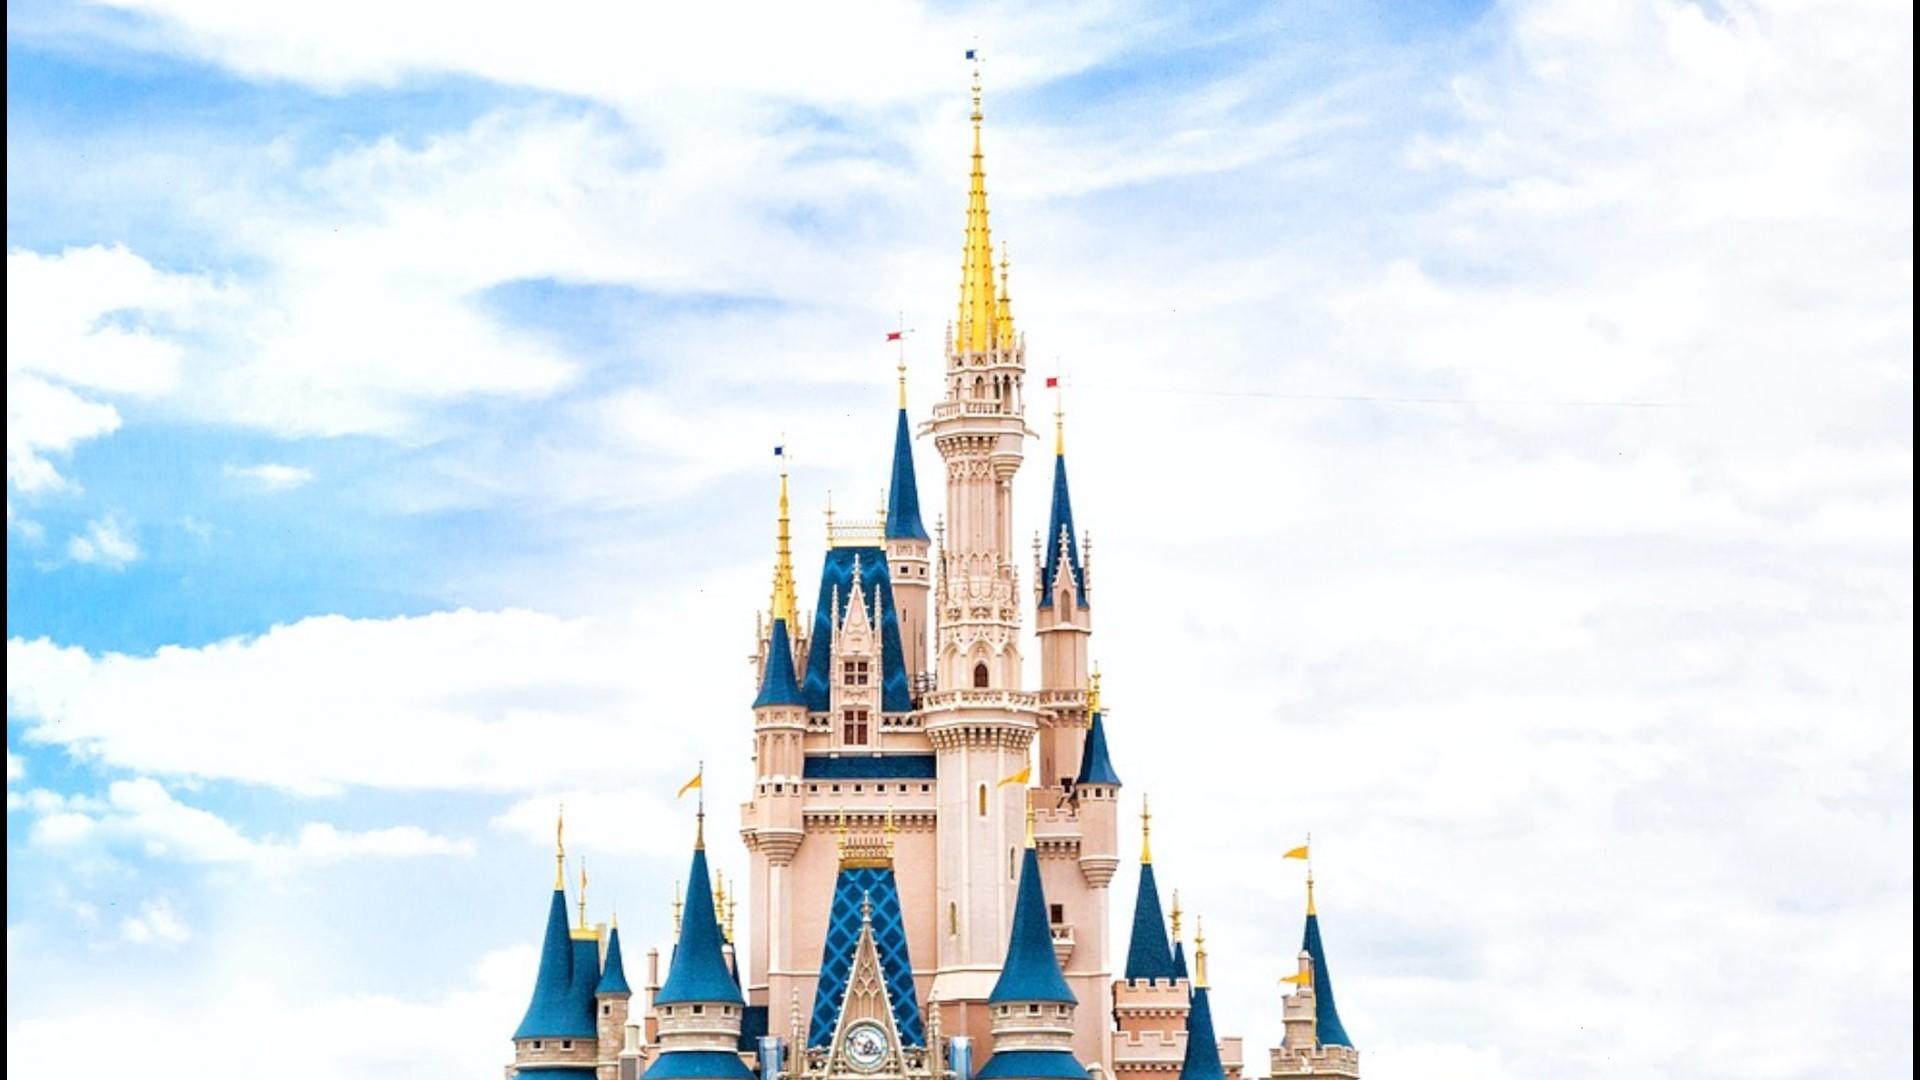 Coronavirus Leads To Interest In Disney S Tangled 13newsnow Com